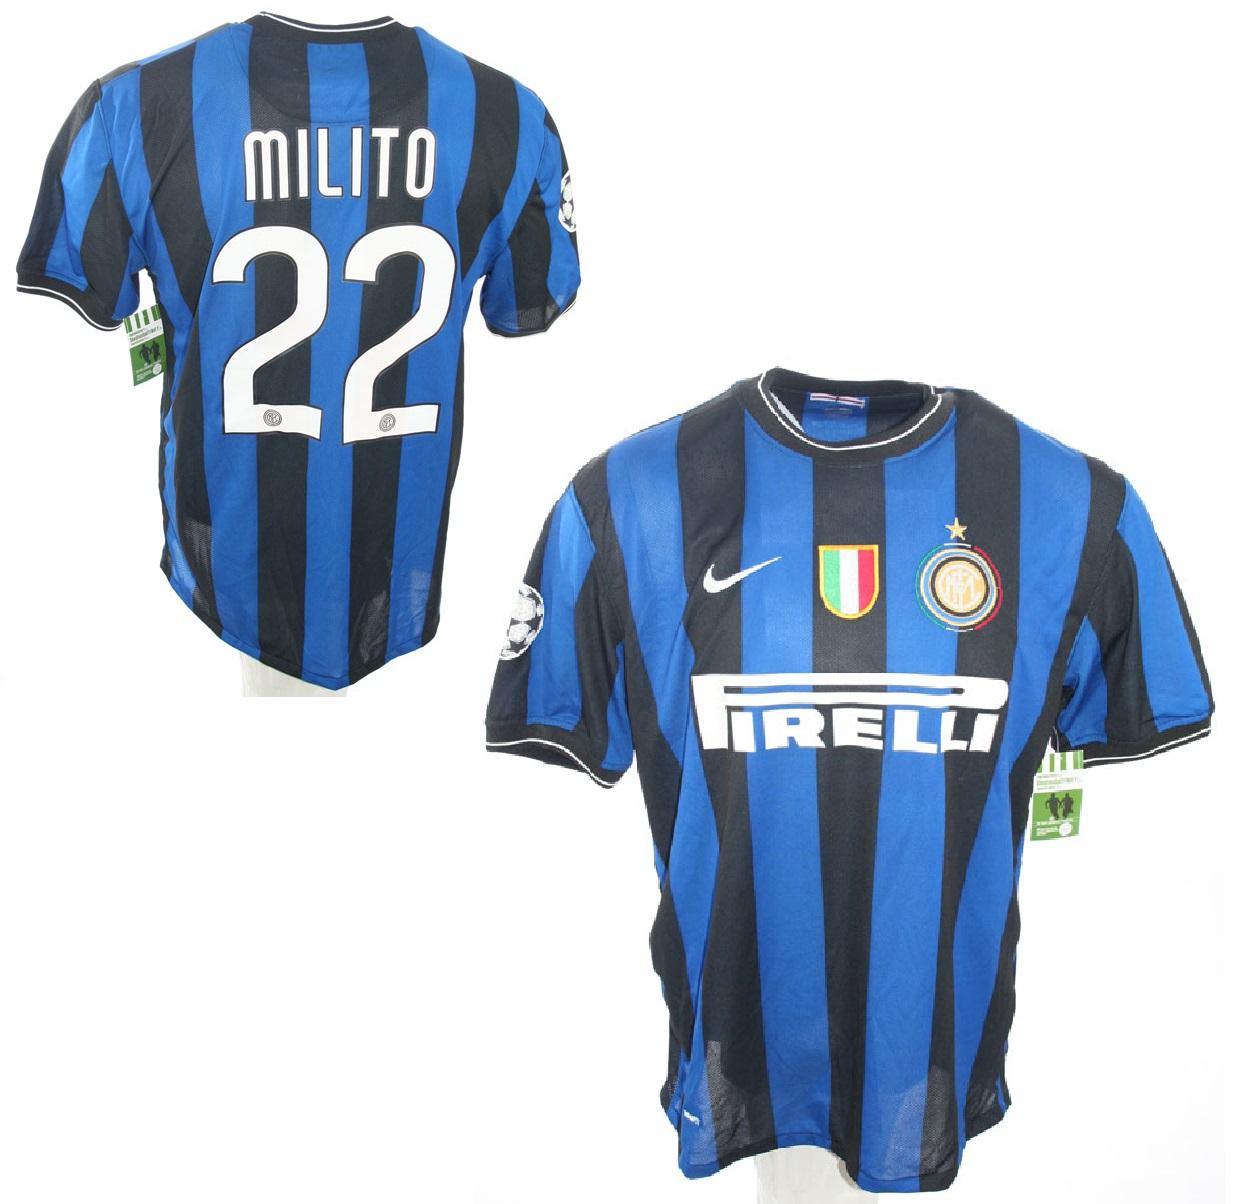 newest c7c66 82ce9 Nike Inter Milan Jersey 22 Milito 2009/10 Pirelli new men's ...